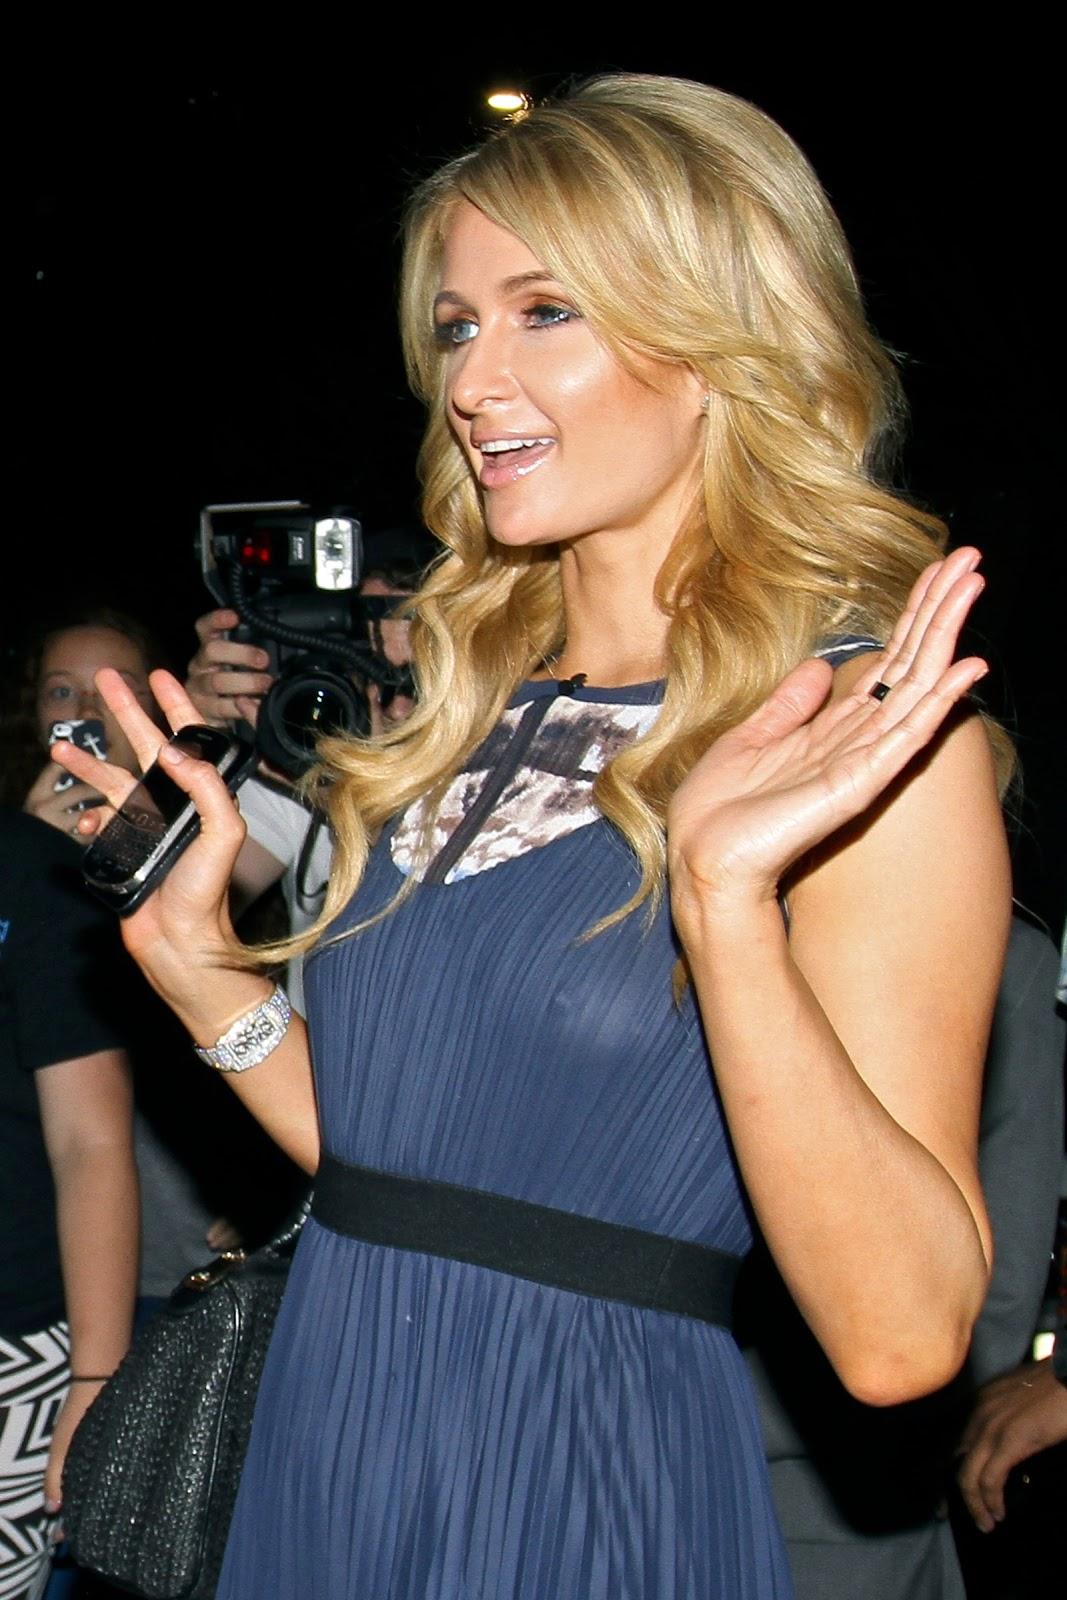 Melissa debling see thru blue lingerie photoshoot - 4 1